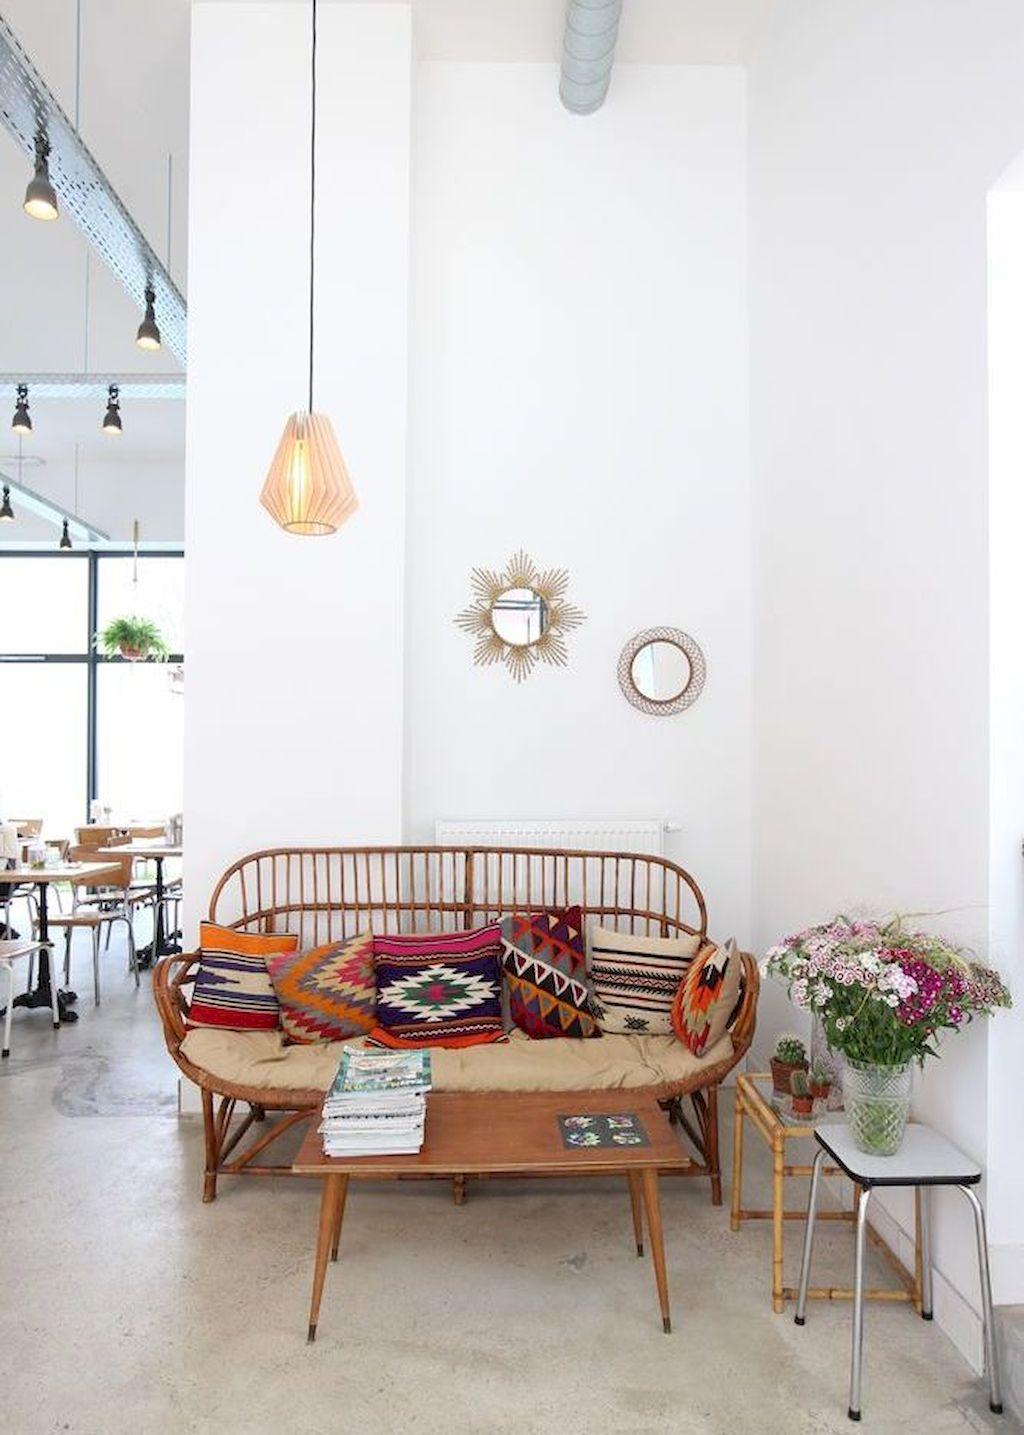 Rattan Furniture092